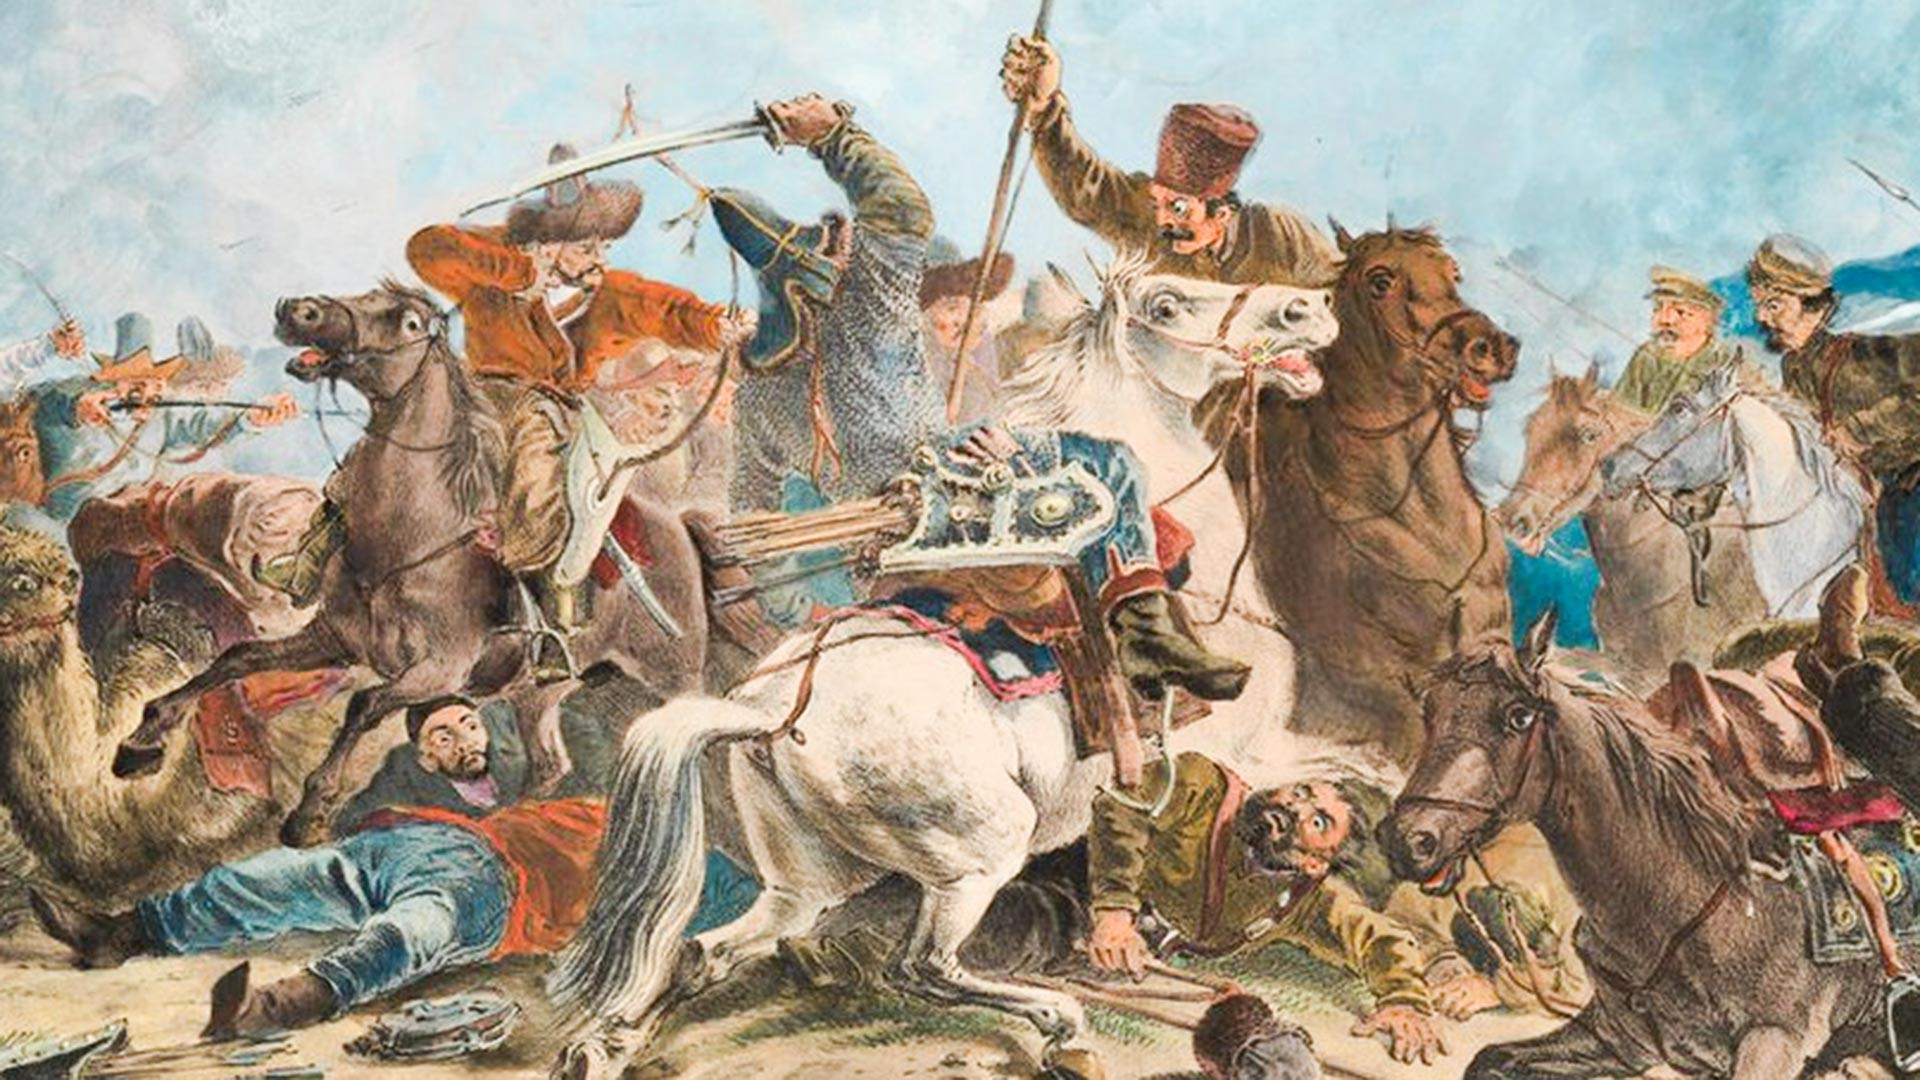 Cosacos luchando contra kirguises.